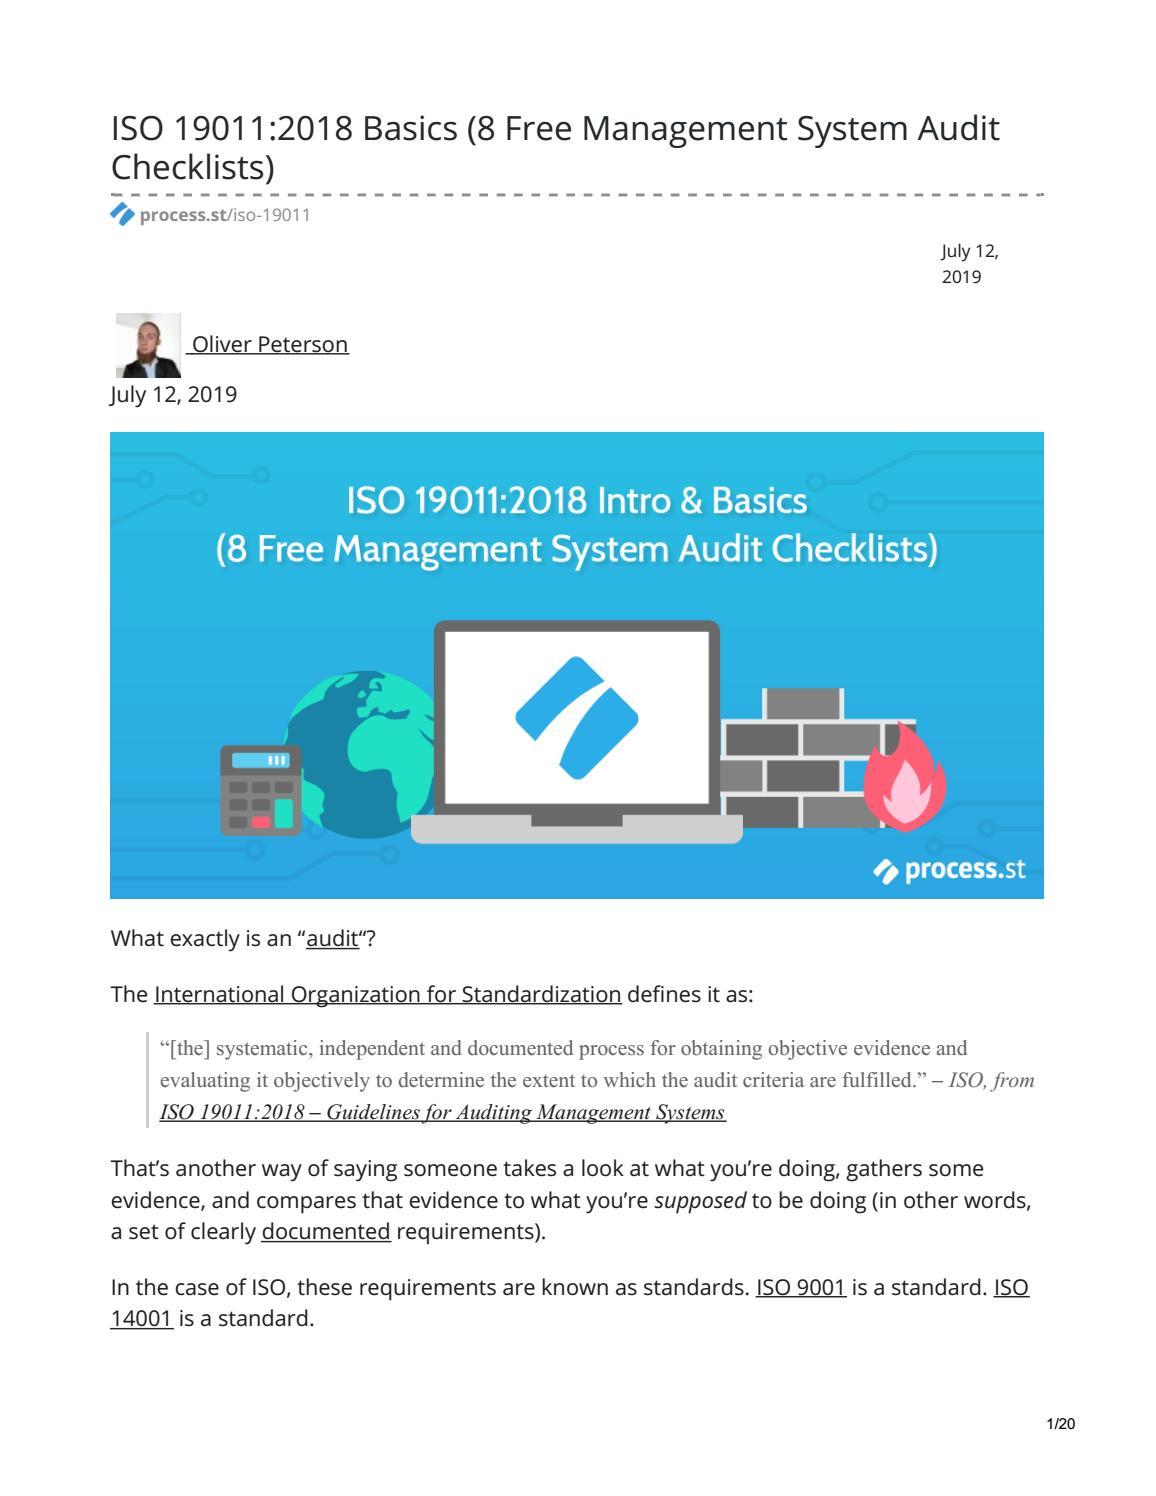 ISO 19011:2018 Basics (8 Free Management System Audit Checklists)